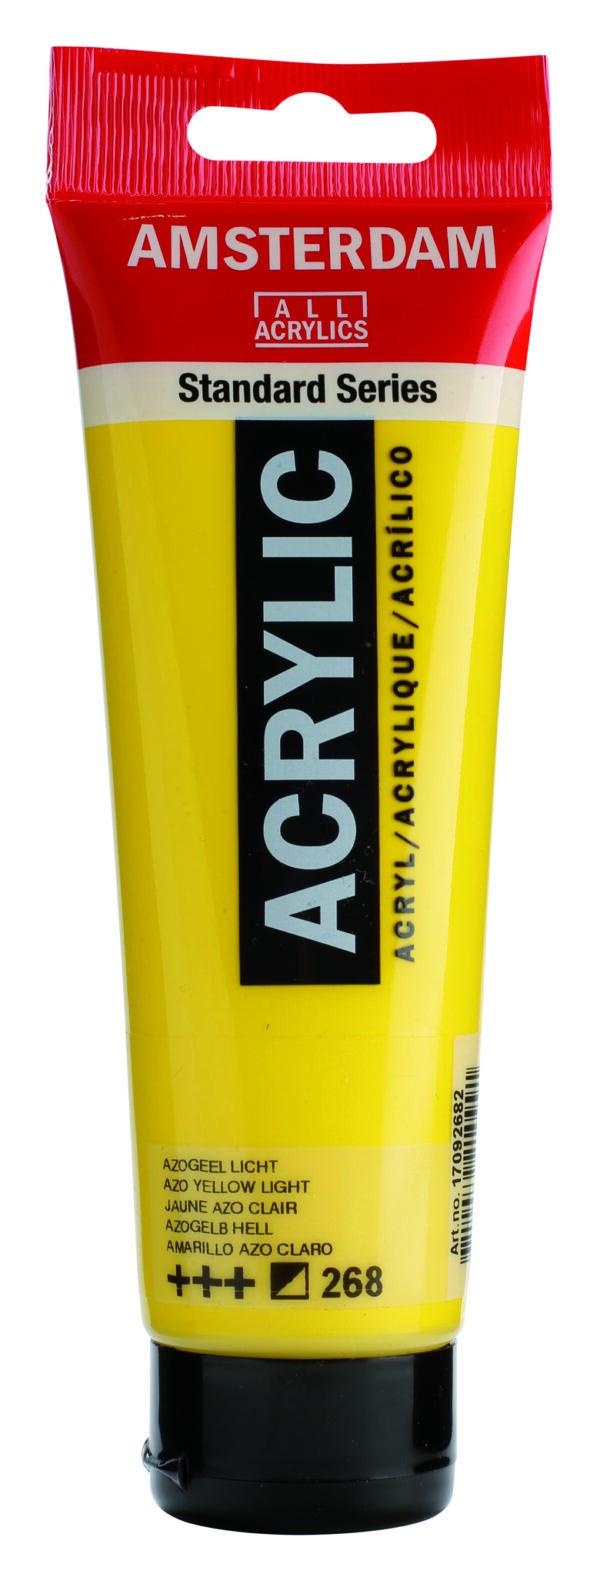 Ams std 268 Azo yellow Light - 120 ml